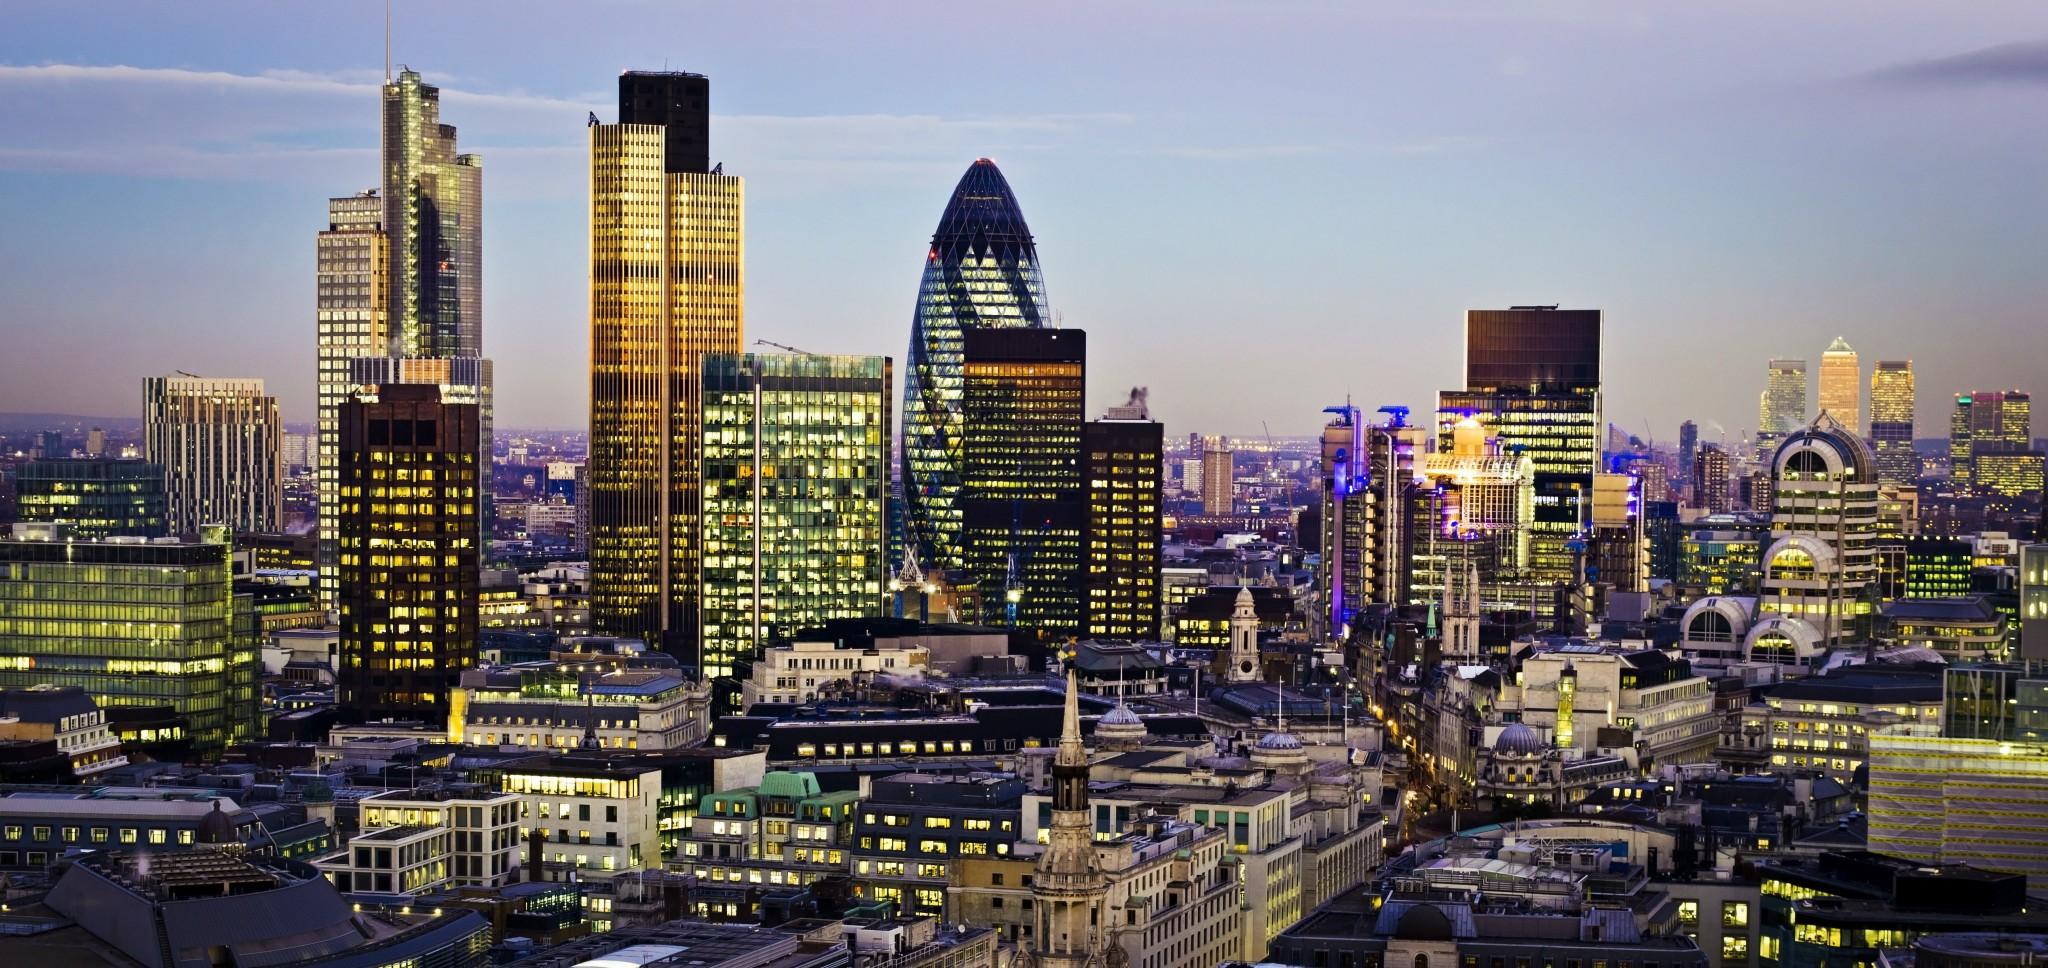 london_night_view_shutterstock_86318047.jpg__5175x2446_q85_crop_upscale